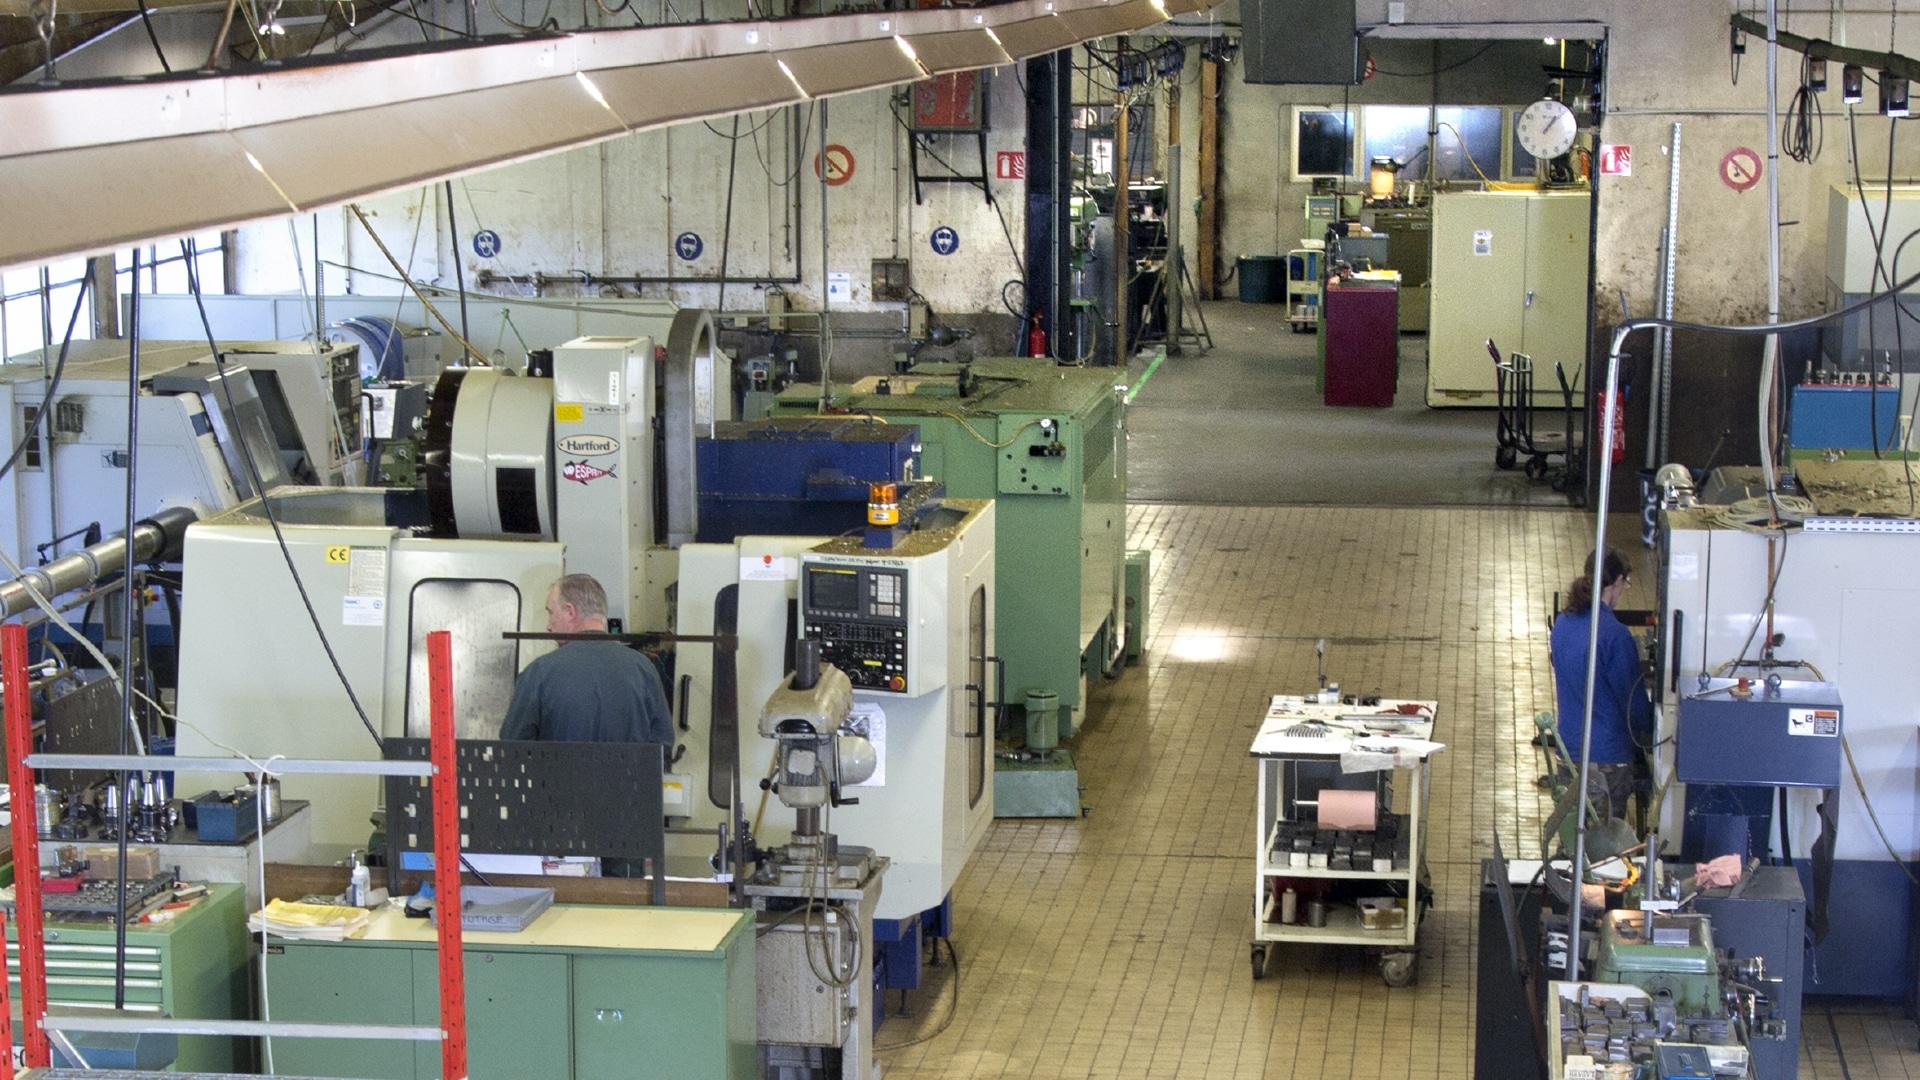 atelier-production-metal-manufacture